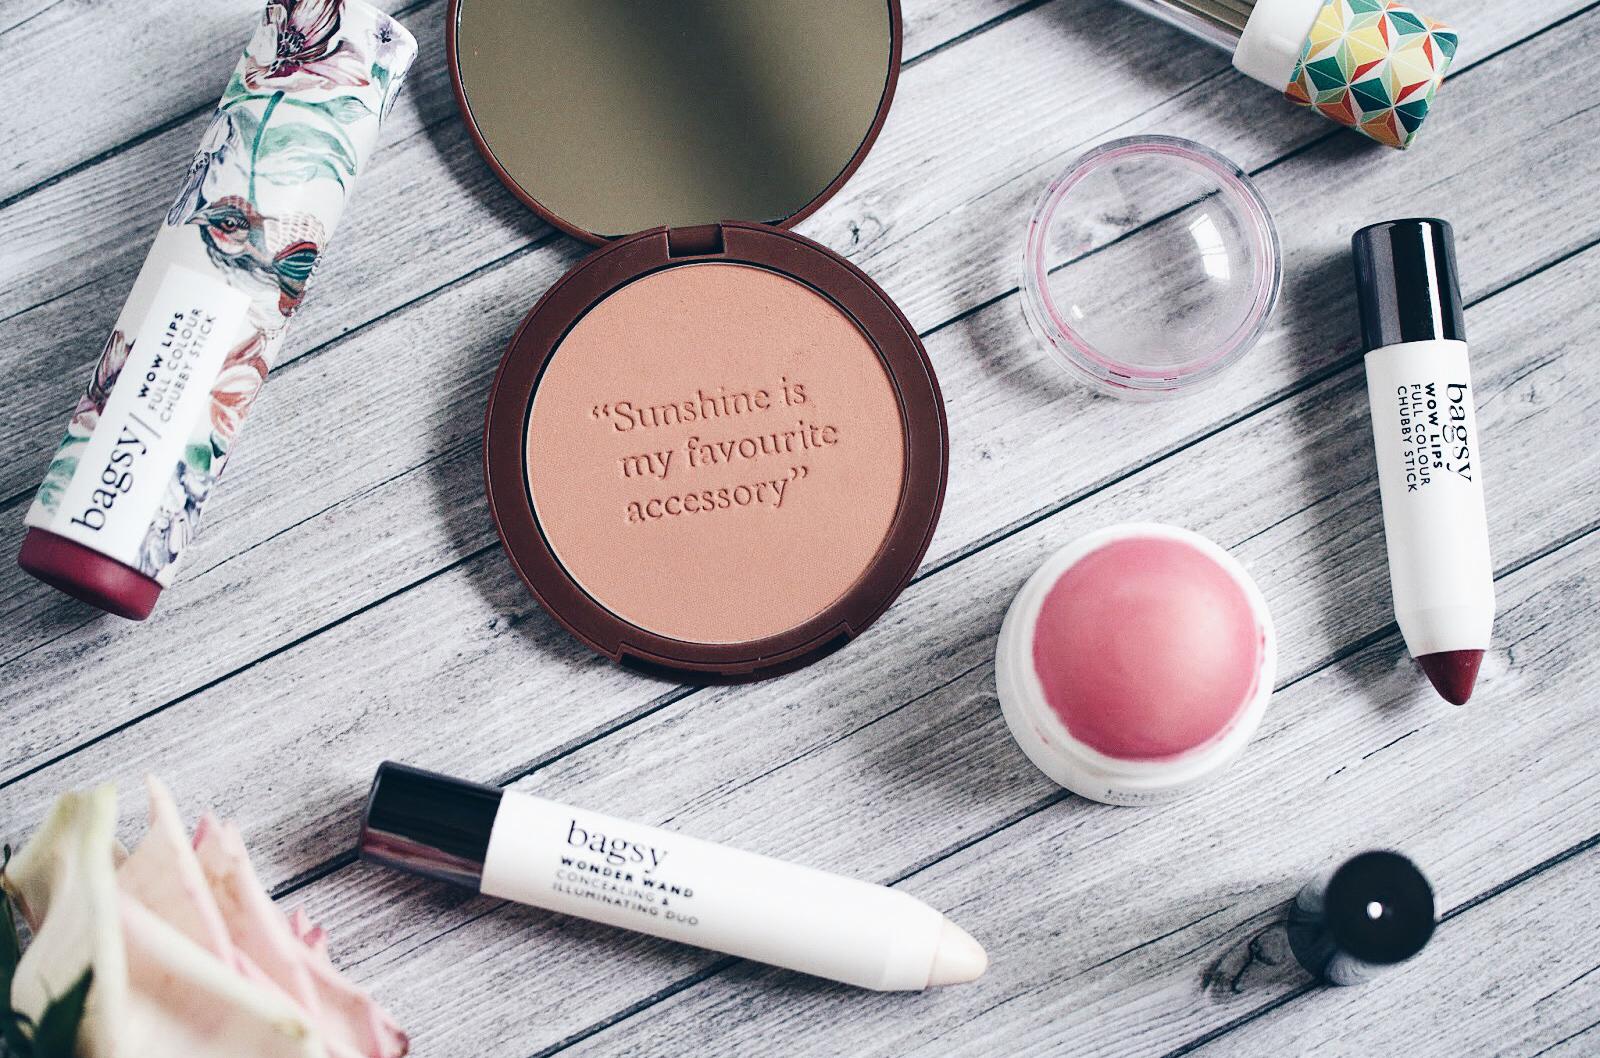 maquillage bagsy monoprix avis test